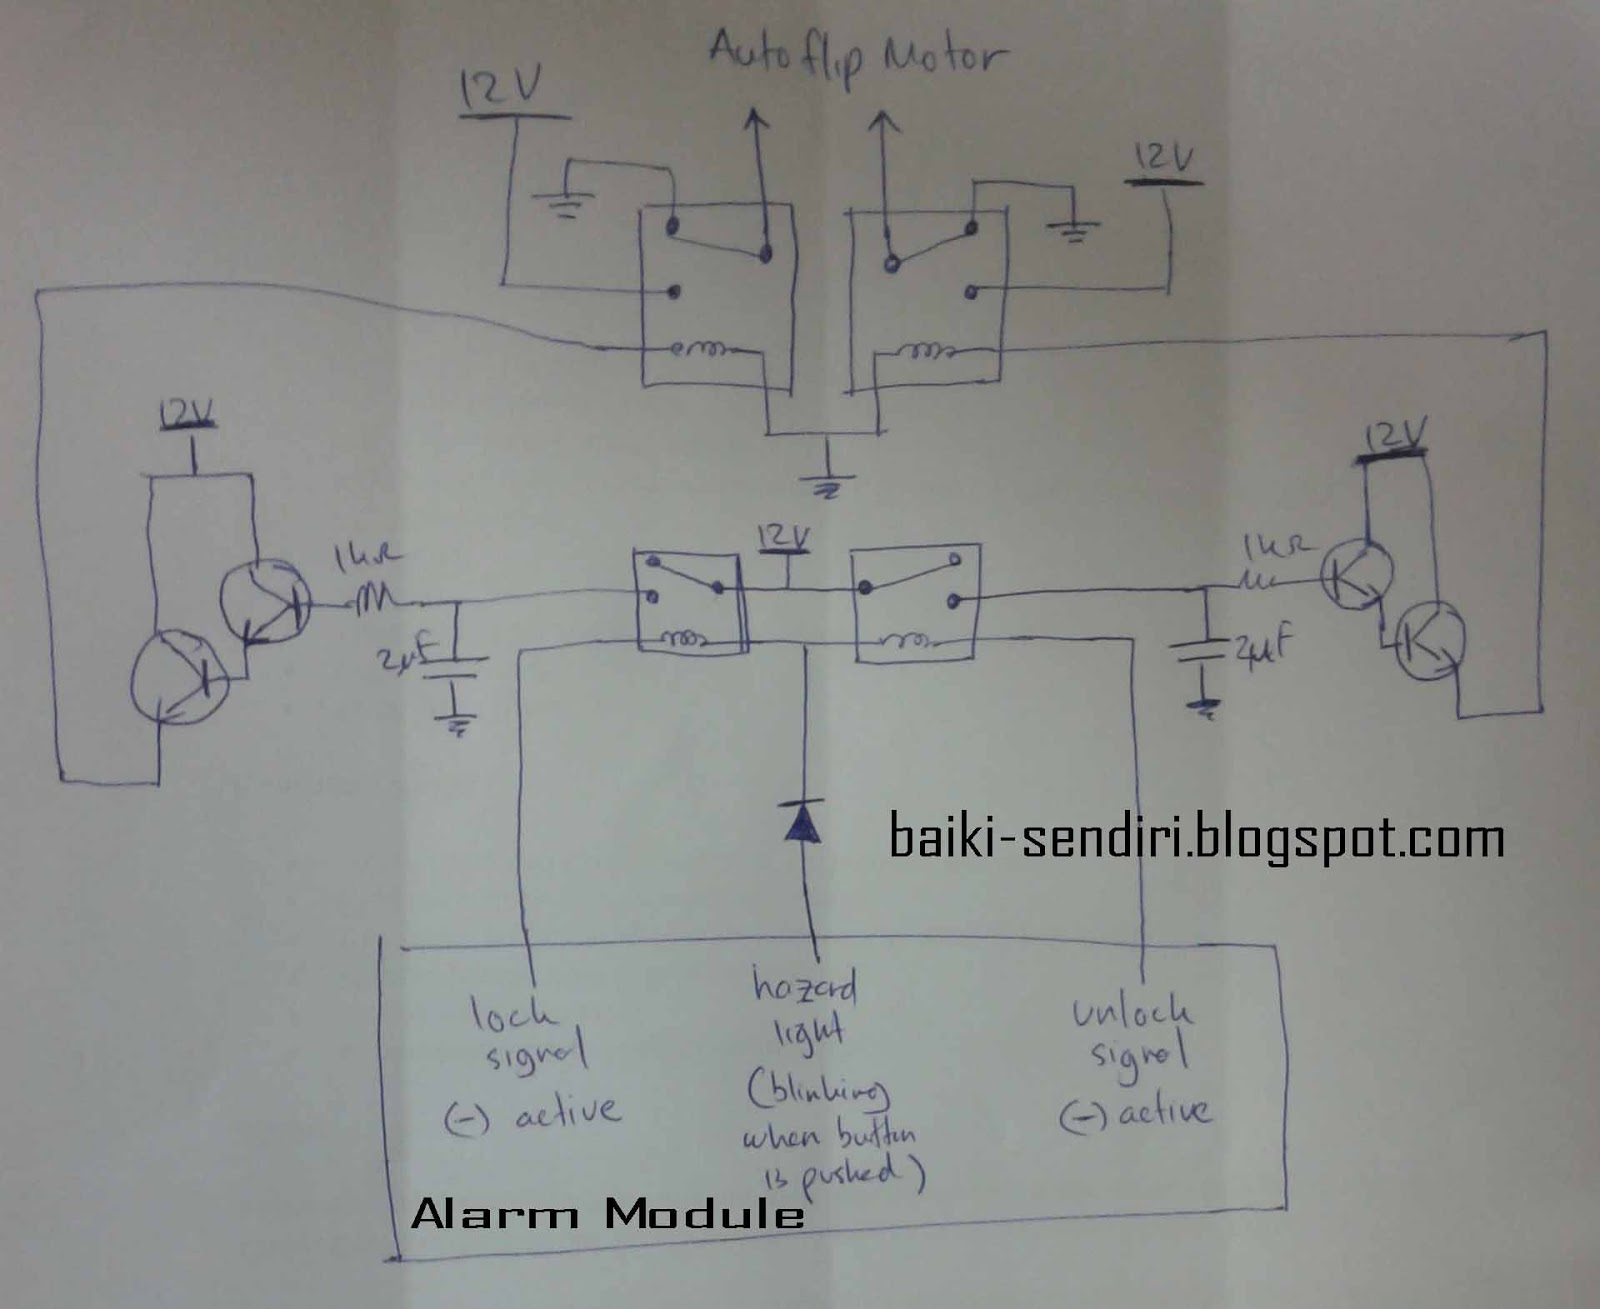 circuit diagram honda prelude 3rd ba5 with alarm auto flip side mirror [ 1600 x 1309 Pixel ]